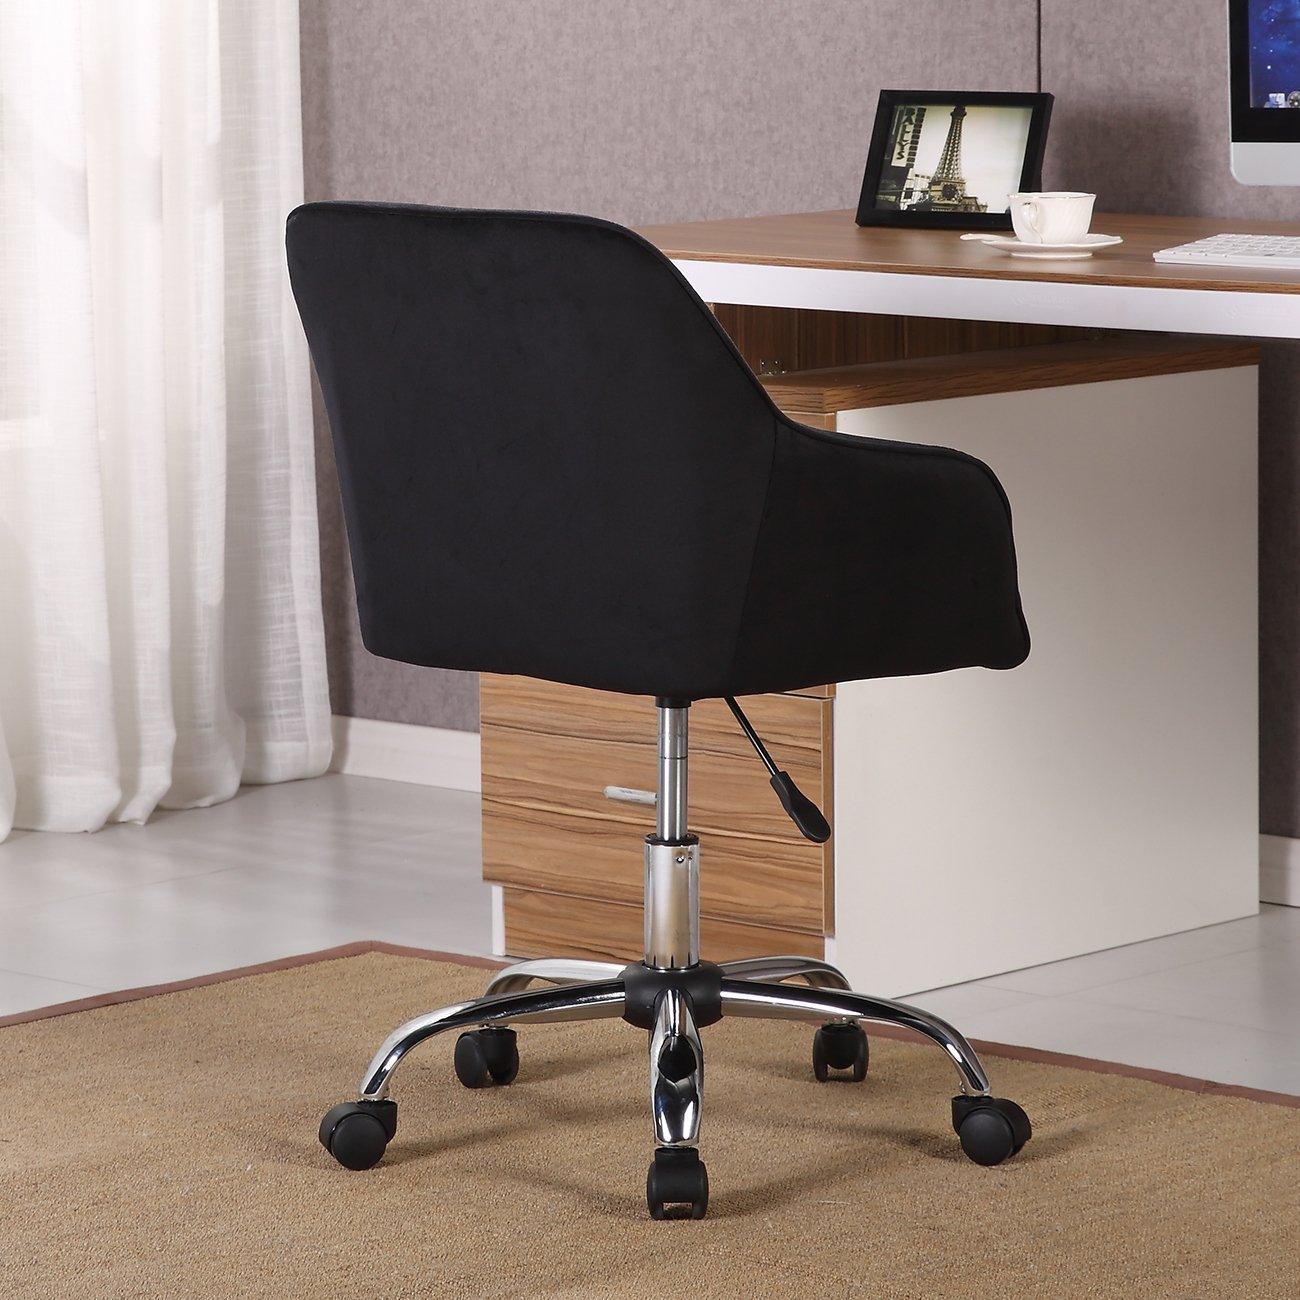 Shop Belleze Modern Office Chair Task Desk Adjustable Swivel Height For Katrina Blue Swivel Glider Chairs (Image 19 of 25)